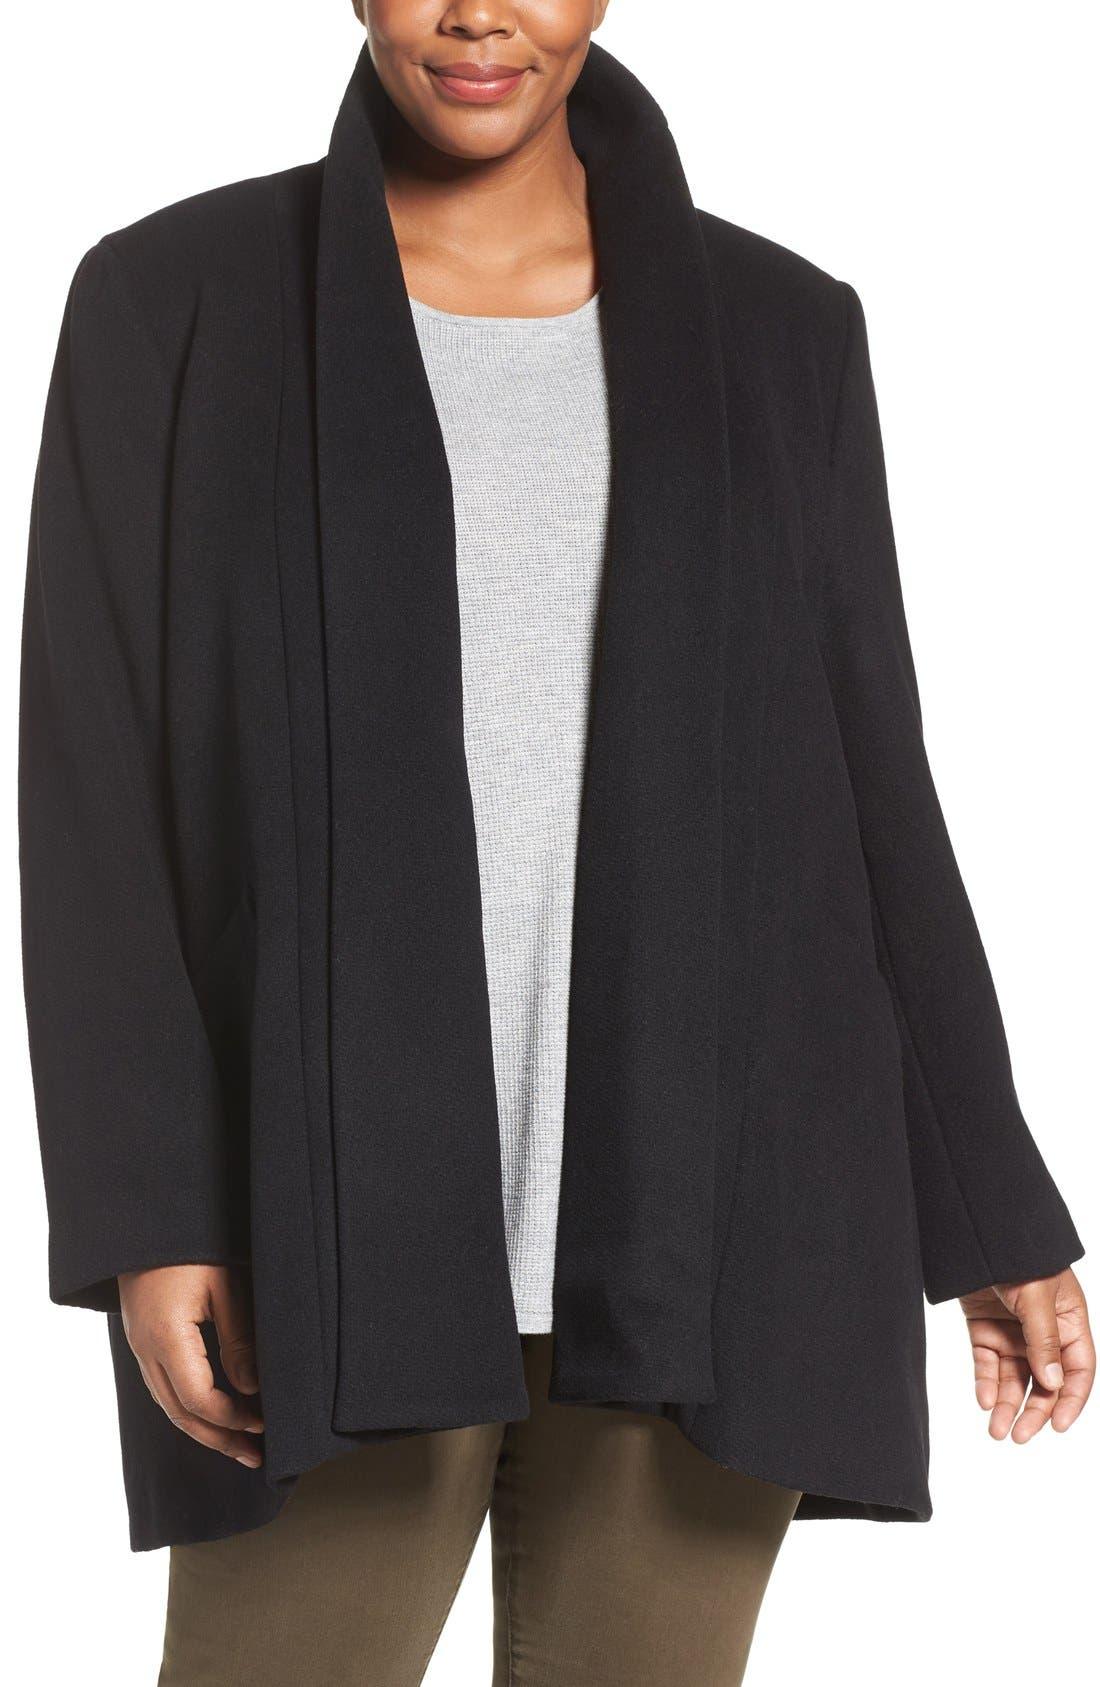 Alternate Image 1 Selected - Calvin Klein Lux Basketweave Flyaway Coat (Plus Size)